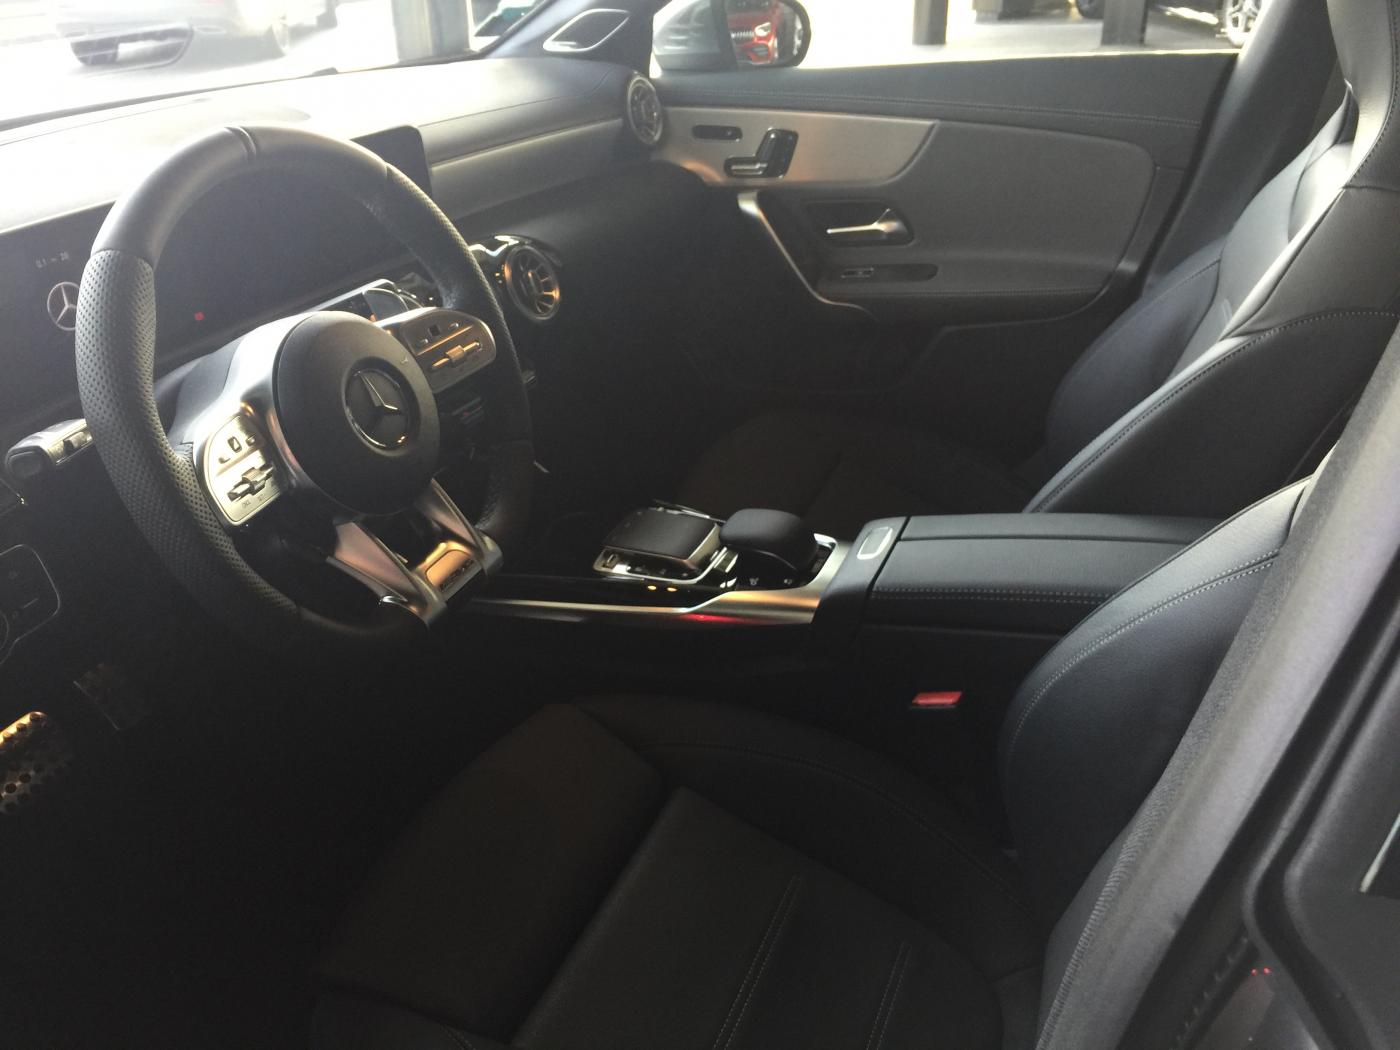 cockpit.jpeg